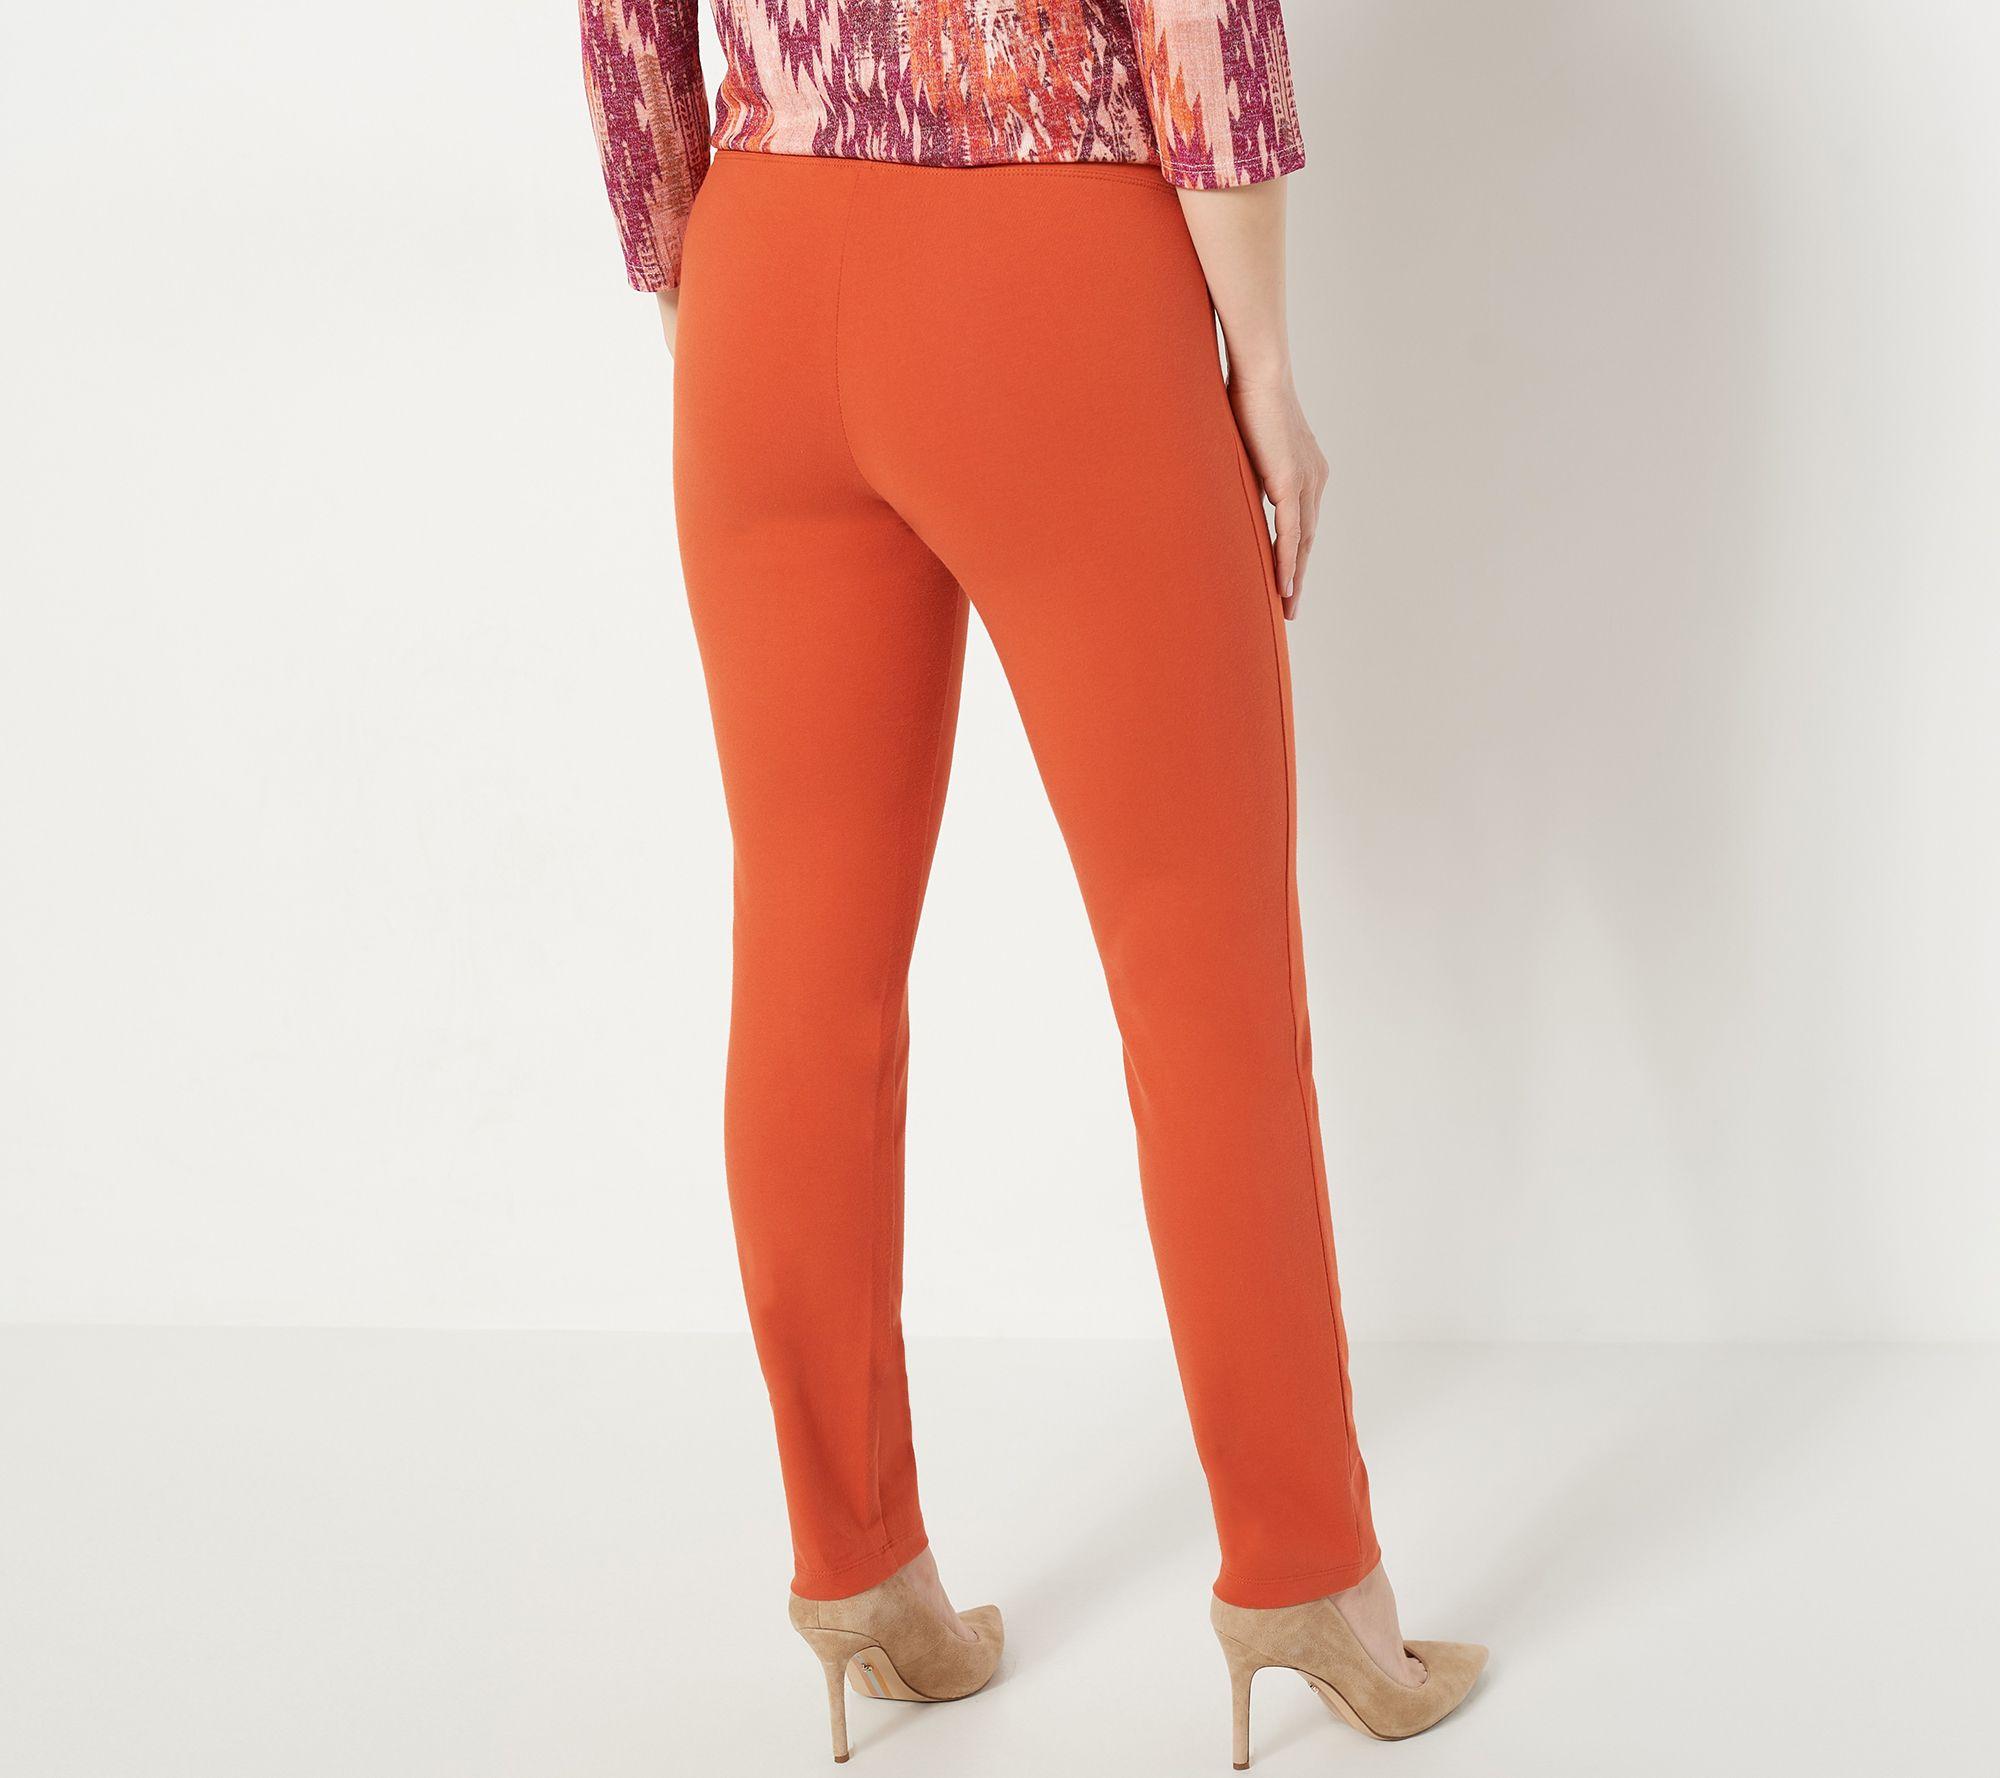 3c7af3cc9 Women with Control Regular Slim Leg Ankle Pants w/ Waist Seams - Page 1 —  QVC.com